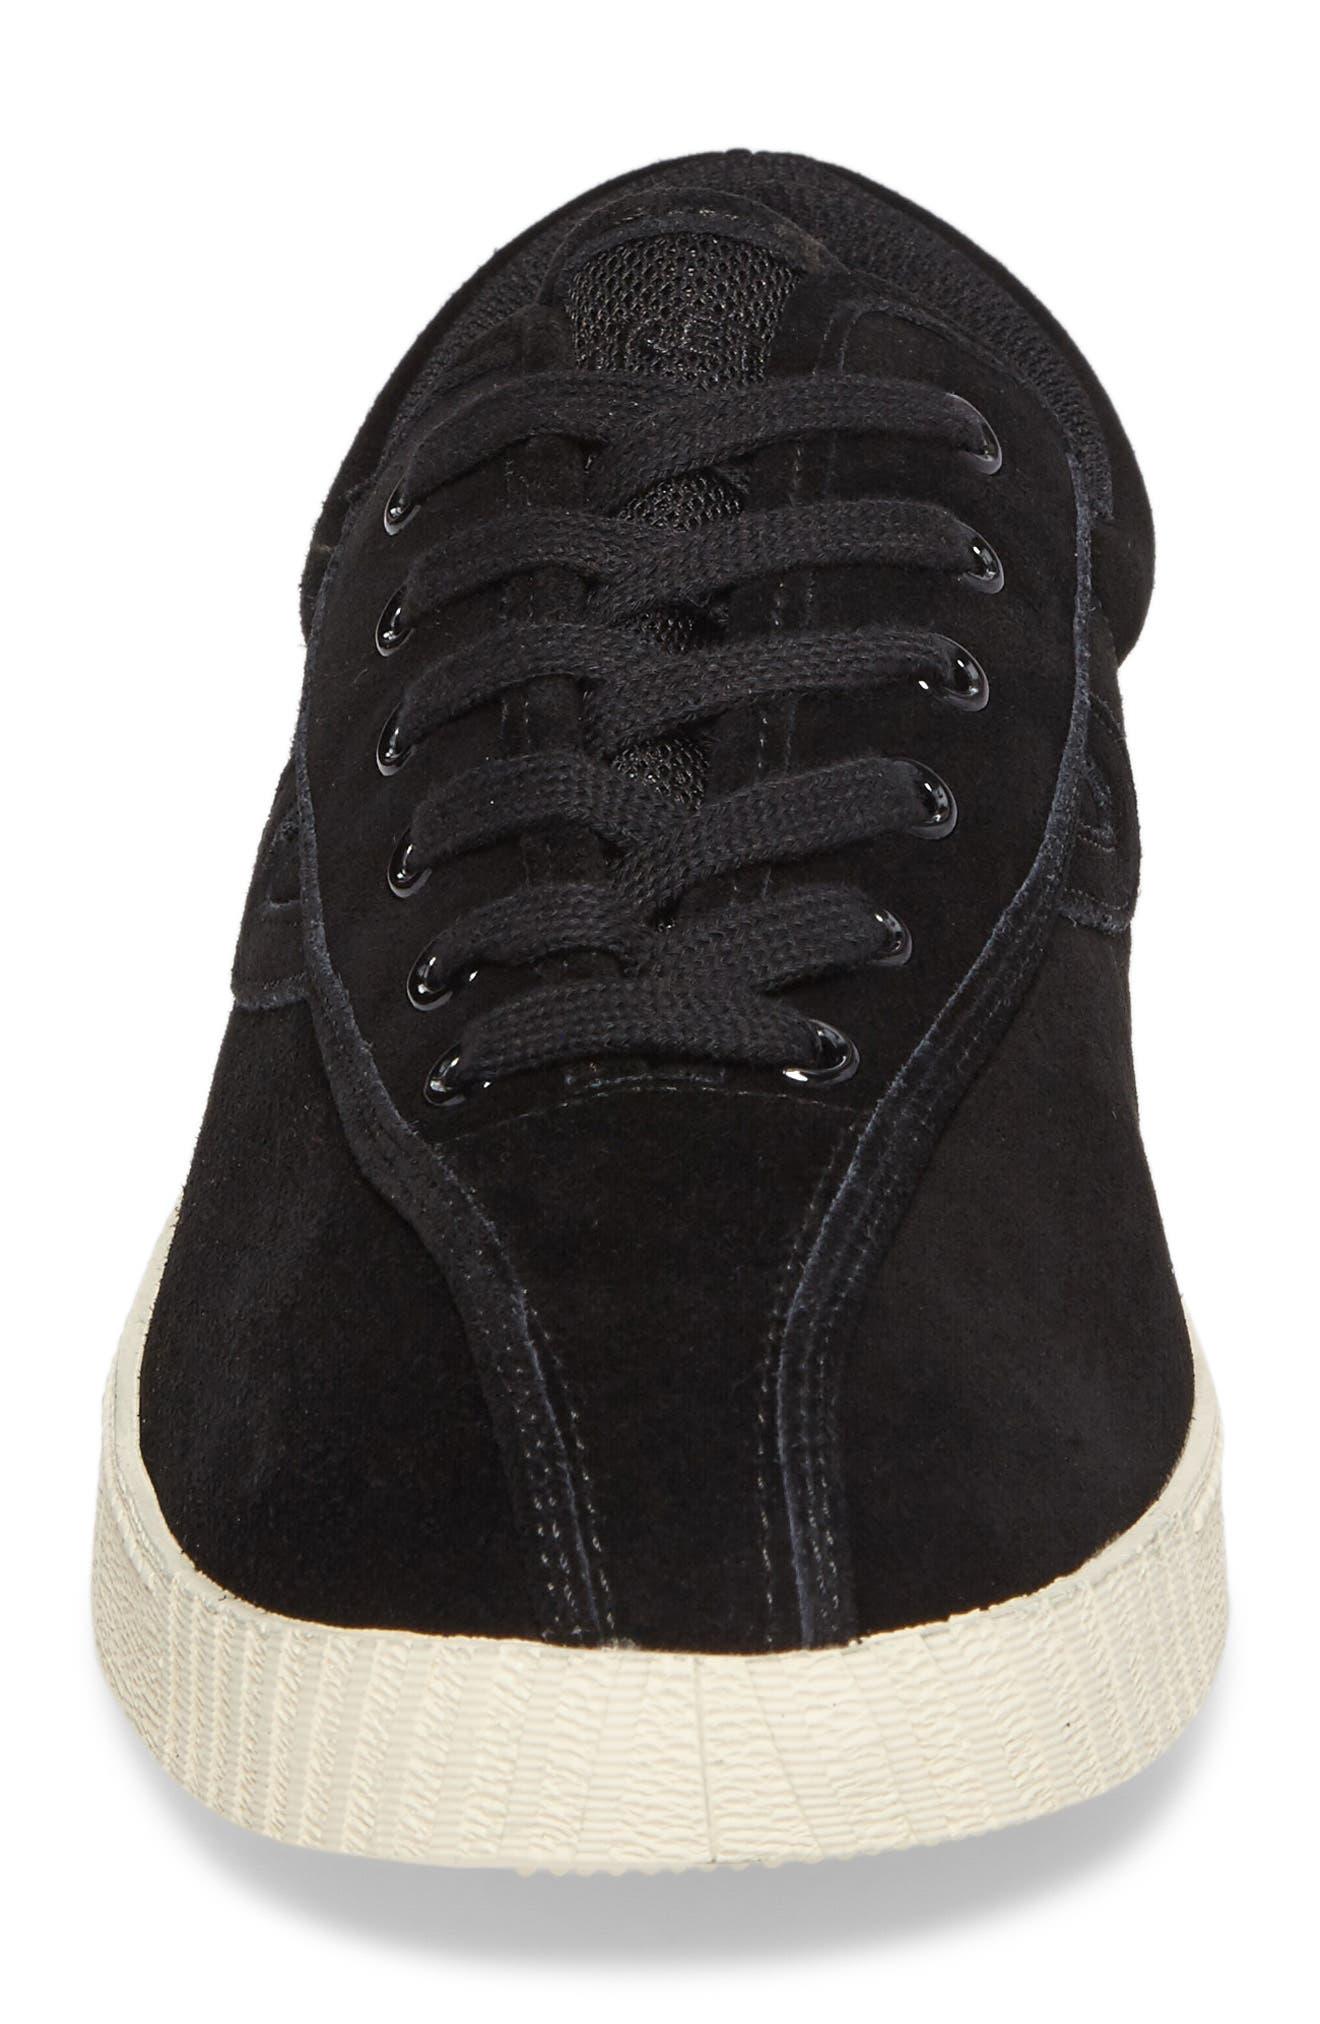 Nylite 16 Sneaker,                             Alternate thumbnail 4, color,                             BLACK/ BLACK SUEDE